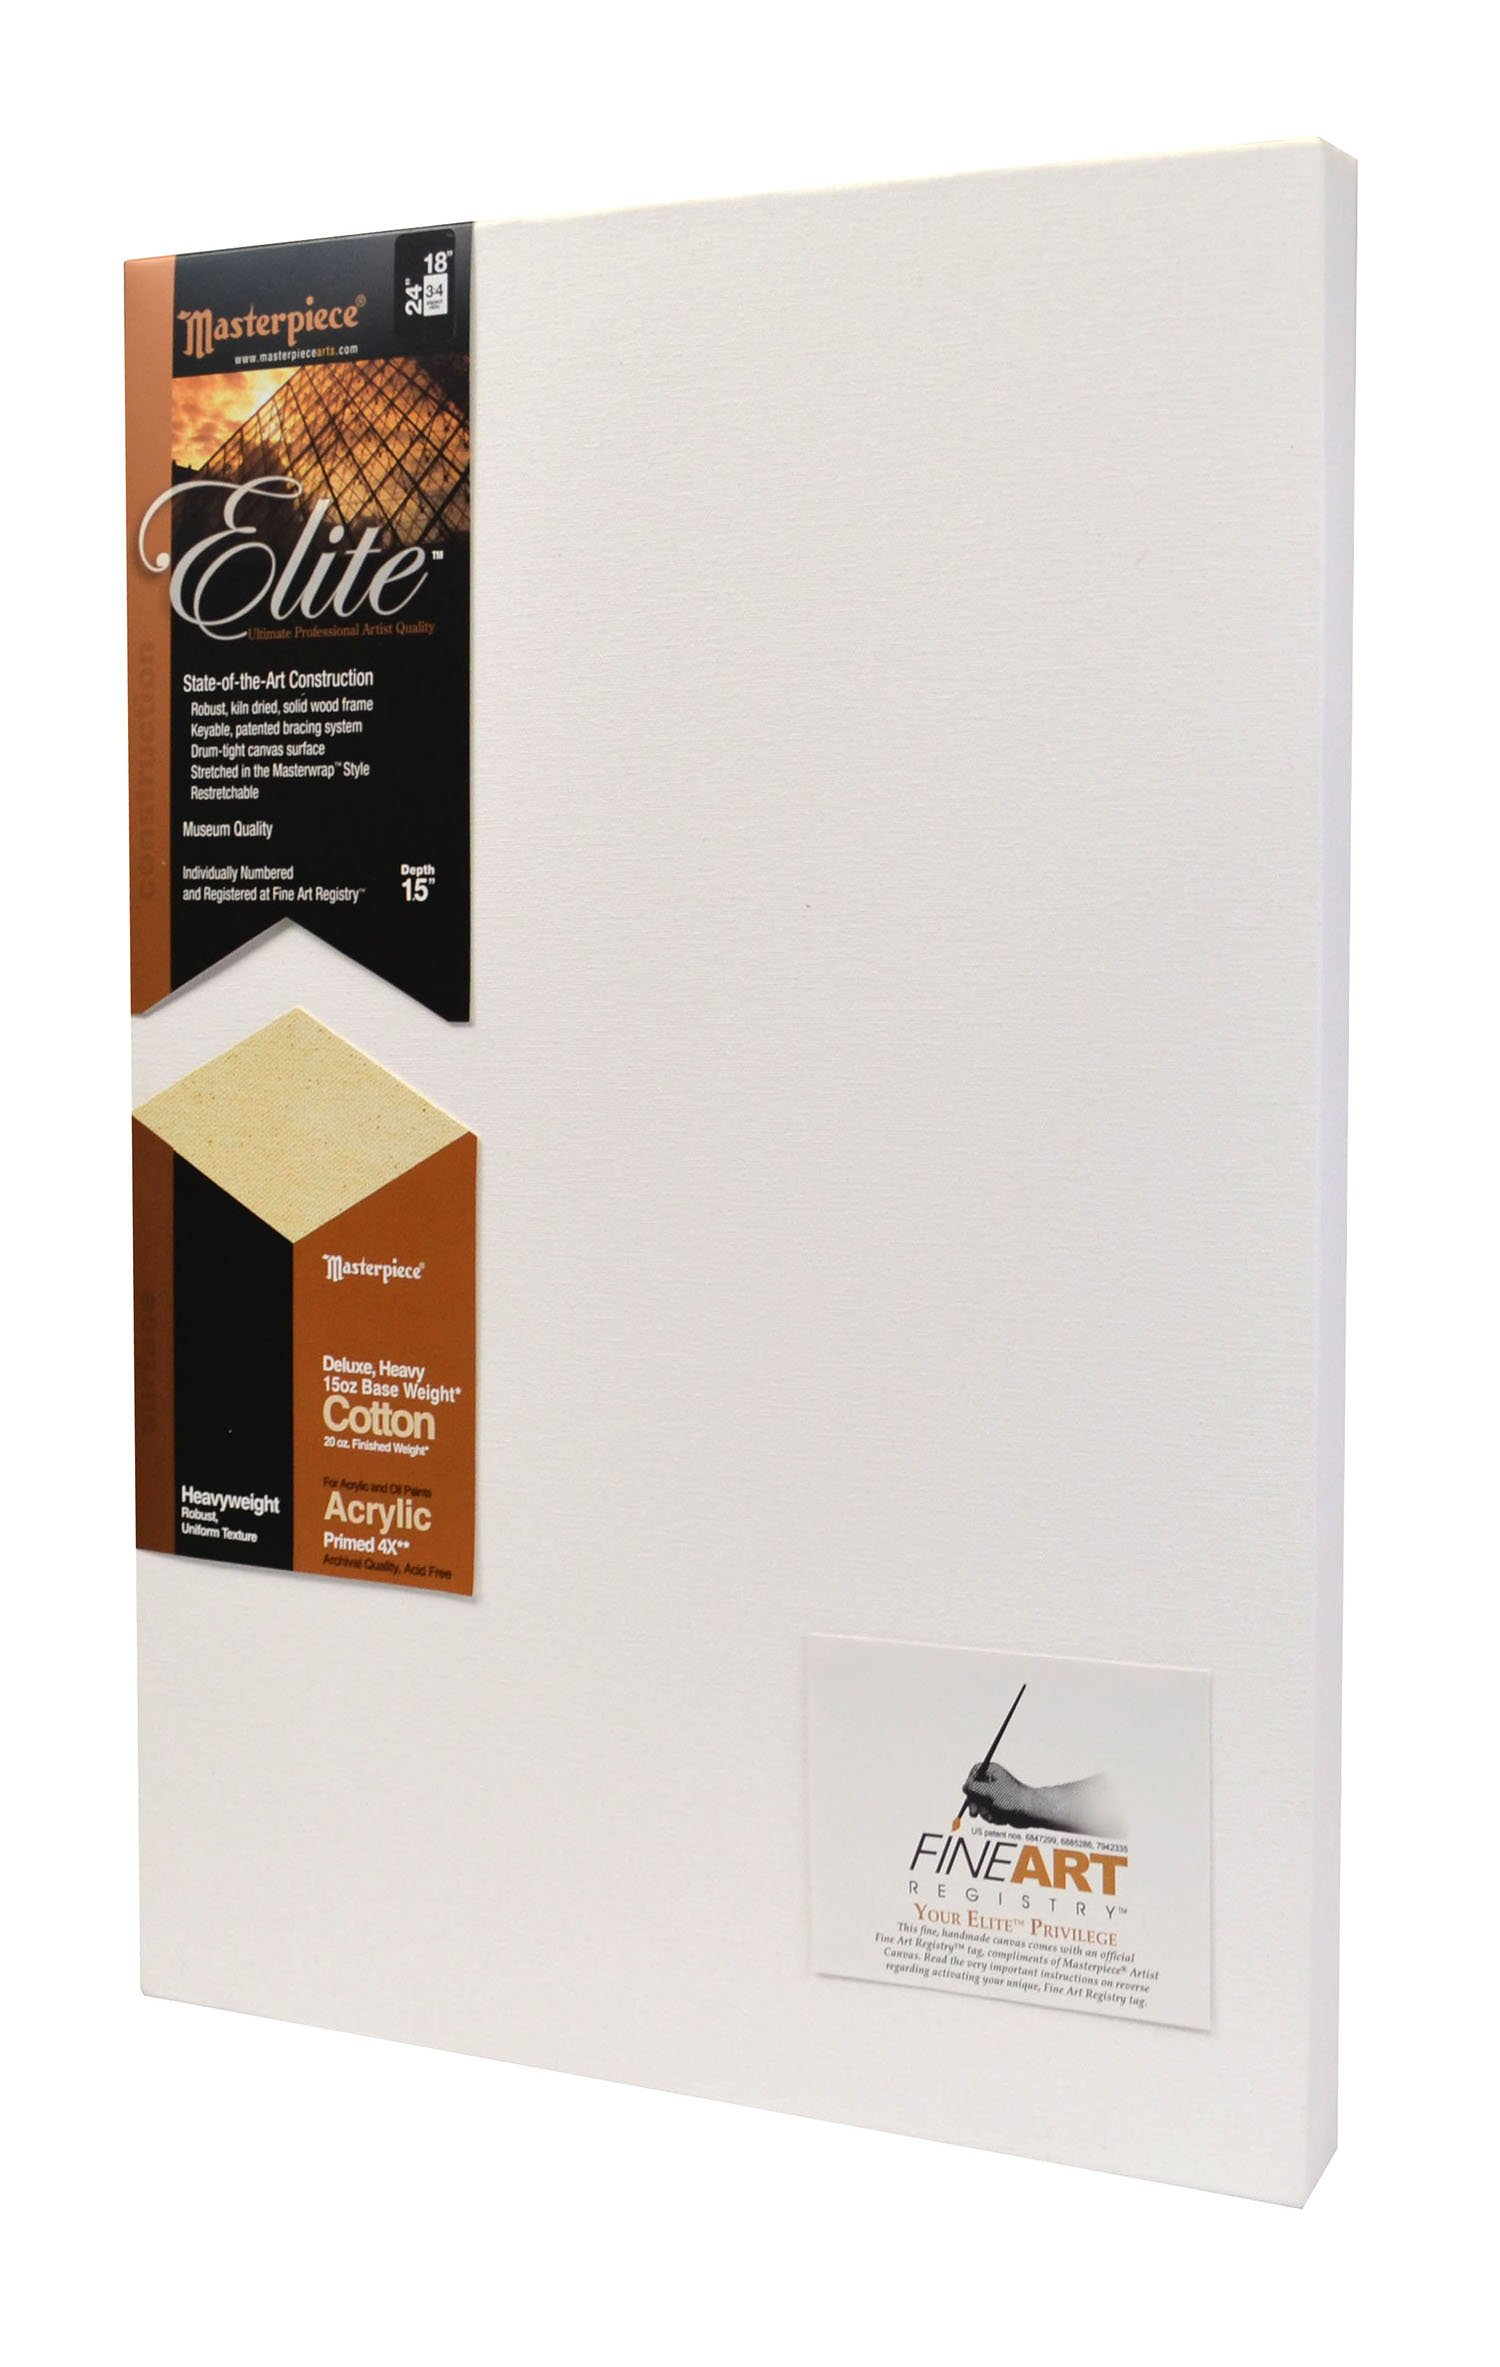 Masterpiece Artist Canvas 34516 Elite 1-1/2'' Deep, 16'' x 16'', Heavy 15-Ounce Acrylic Primed Cotton